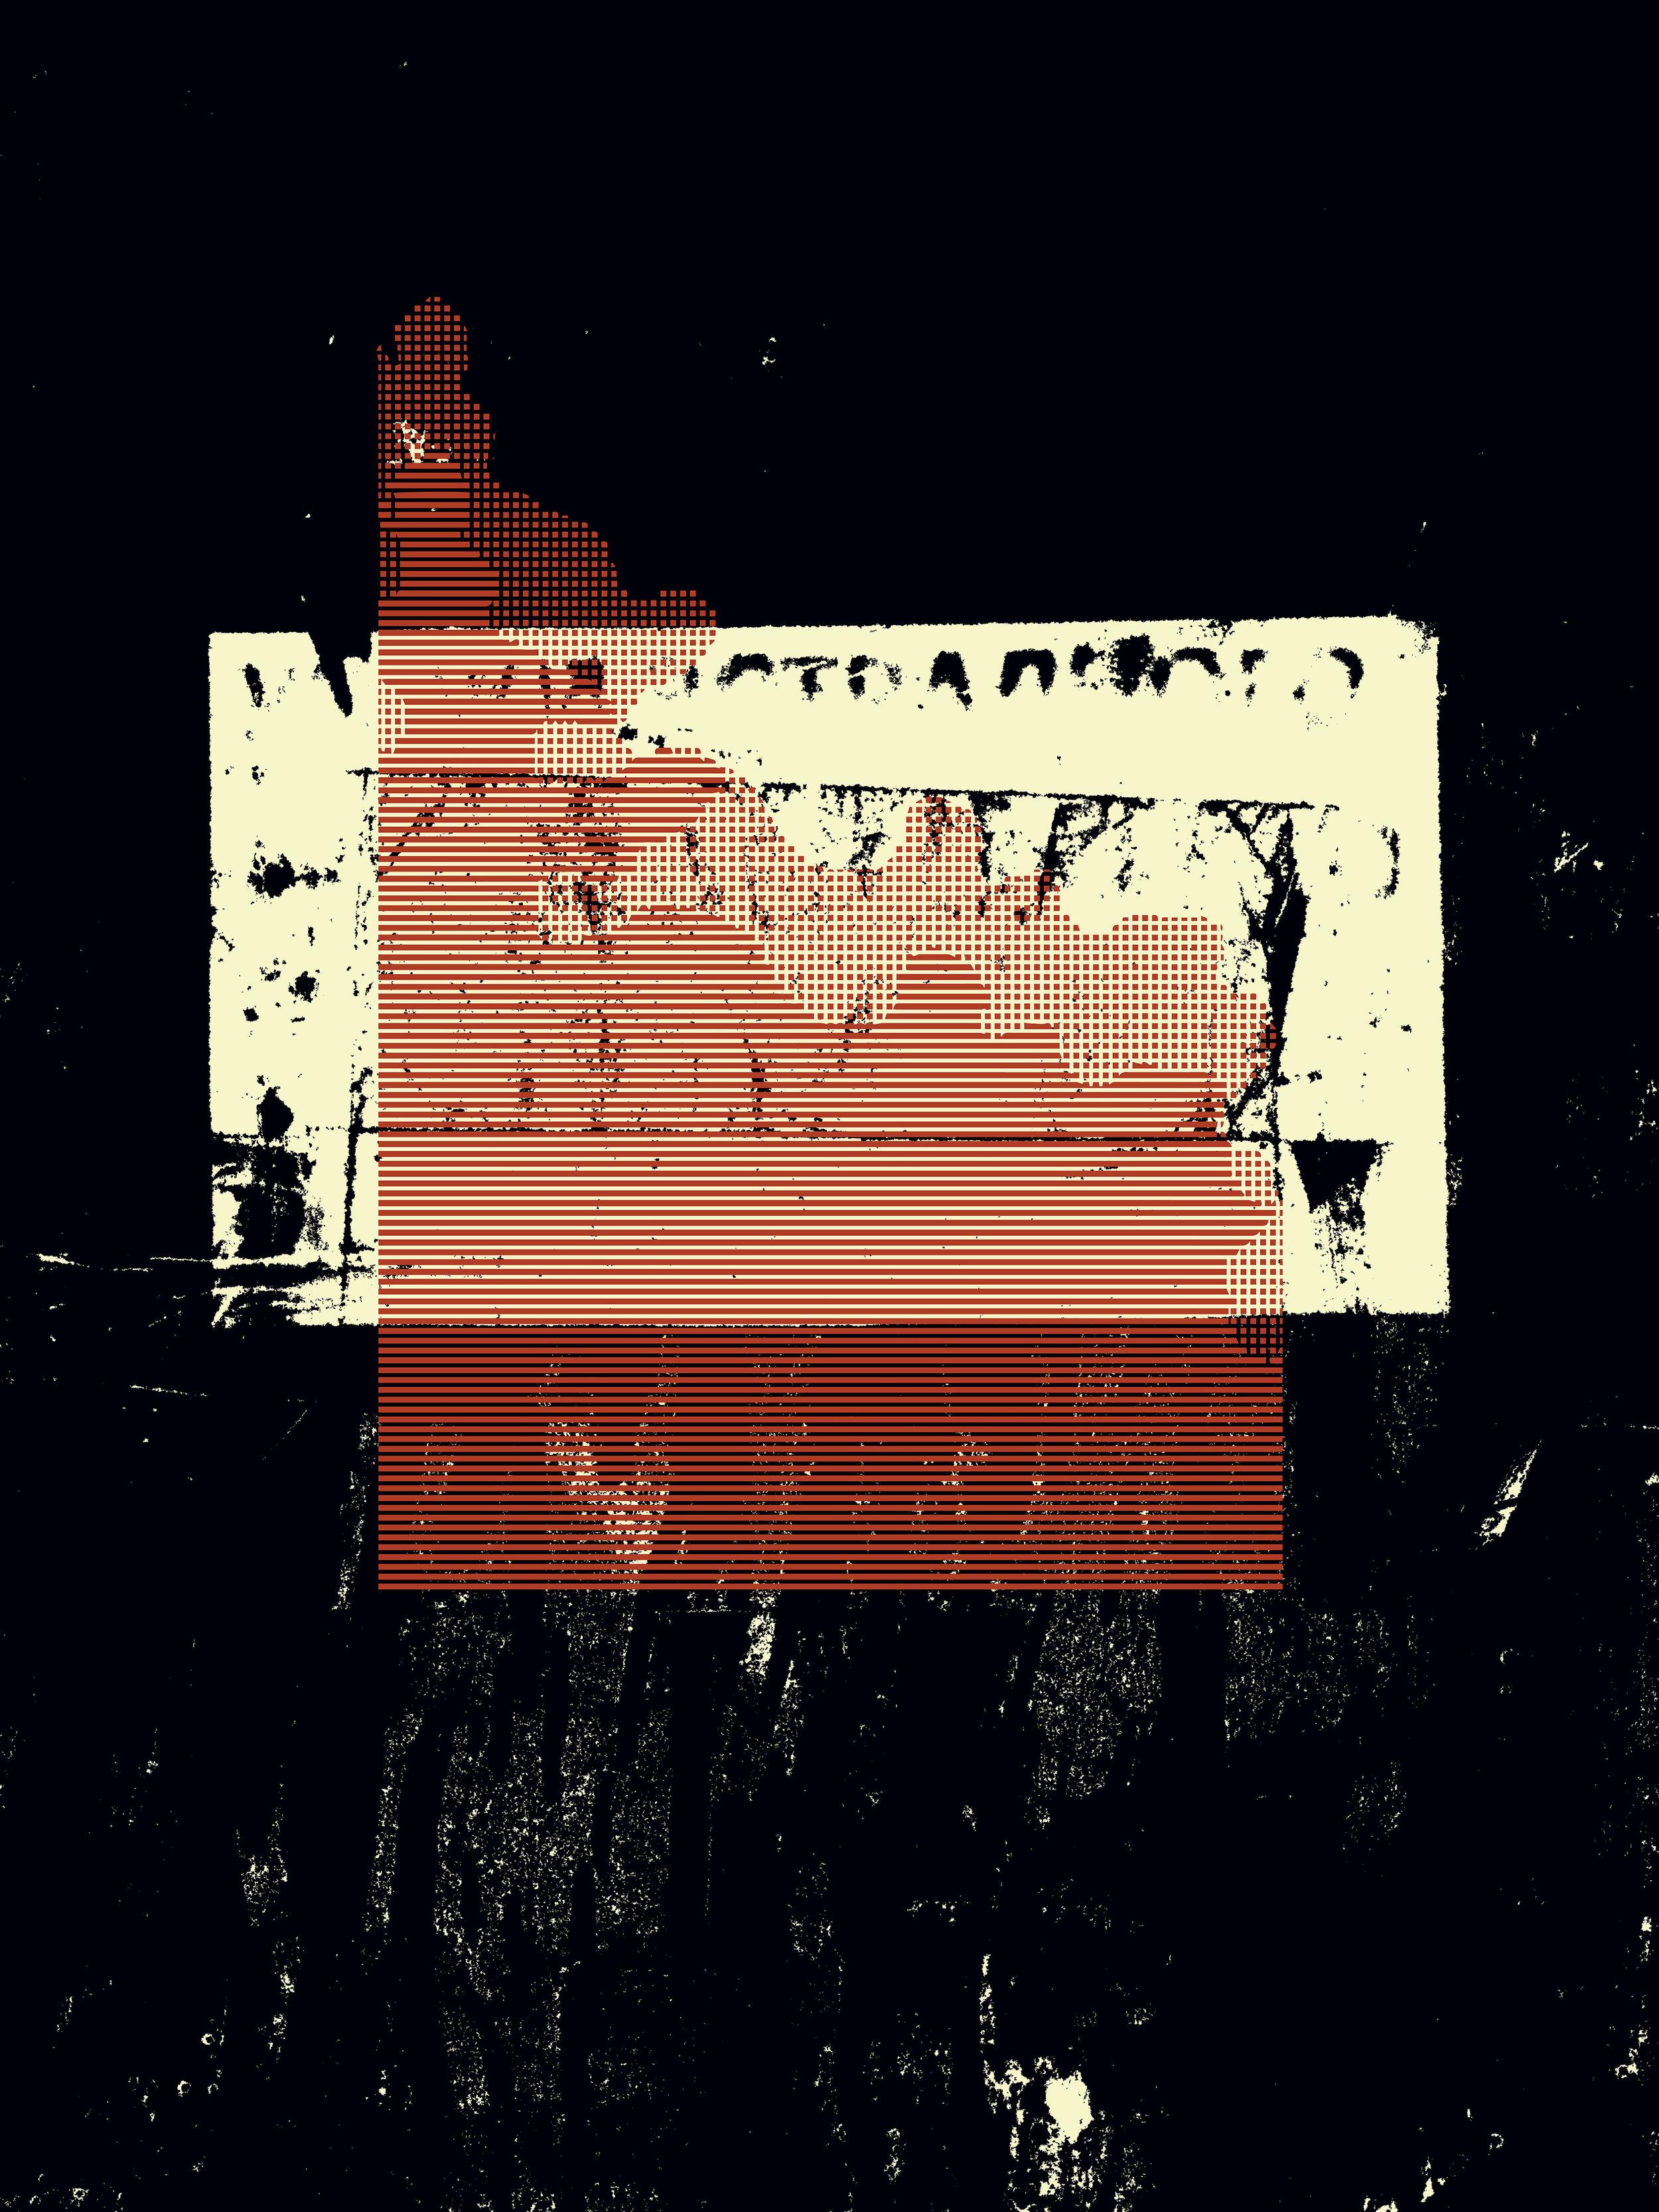 Actual Process 1. - archival inkjet print; 2019